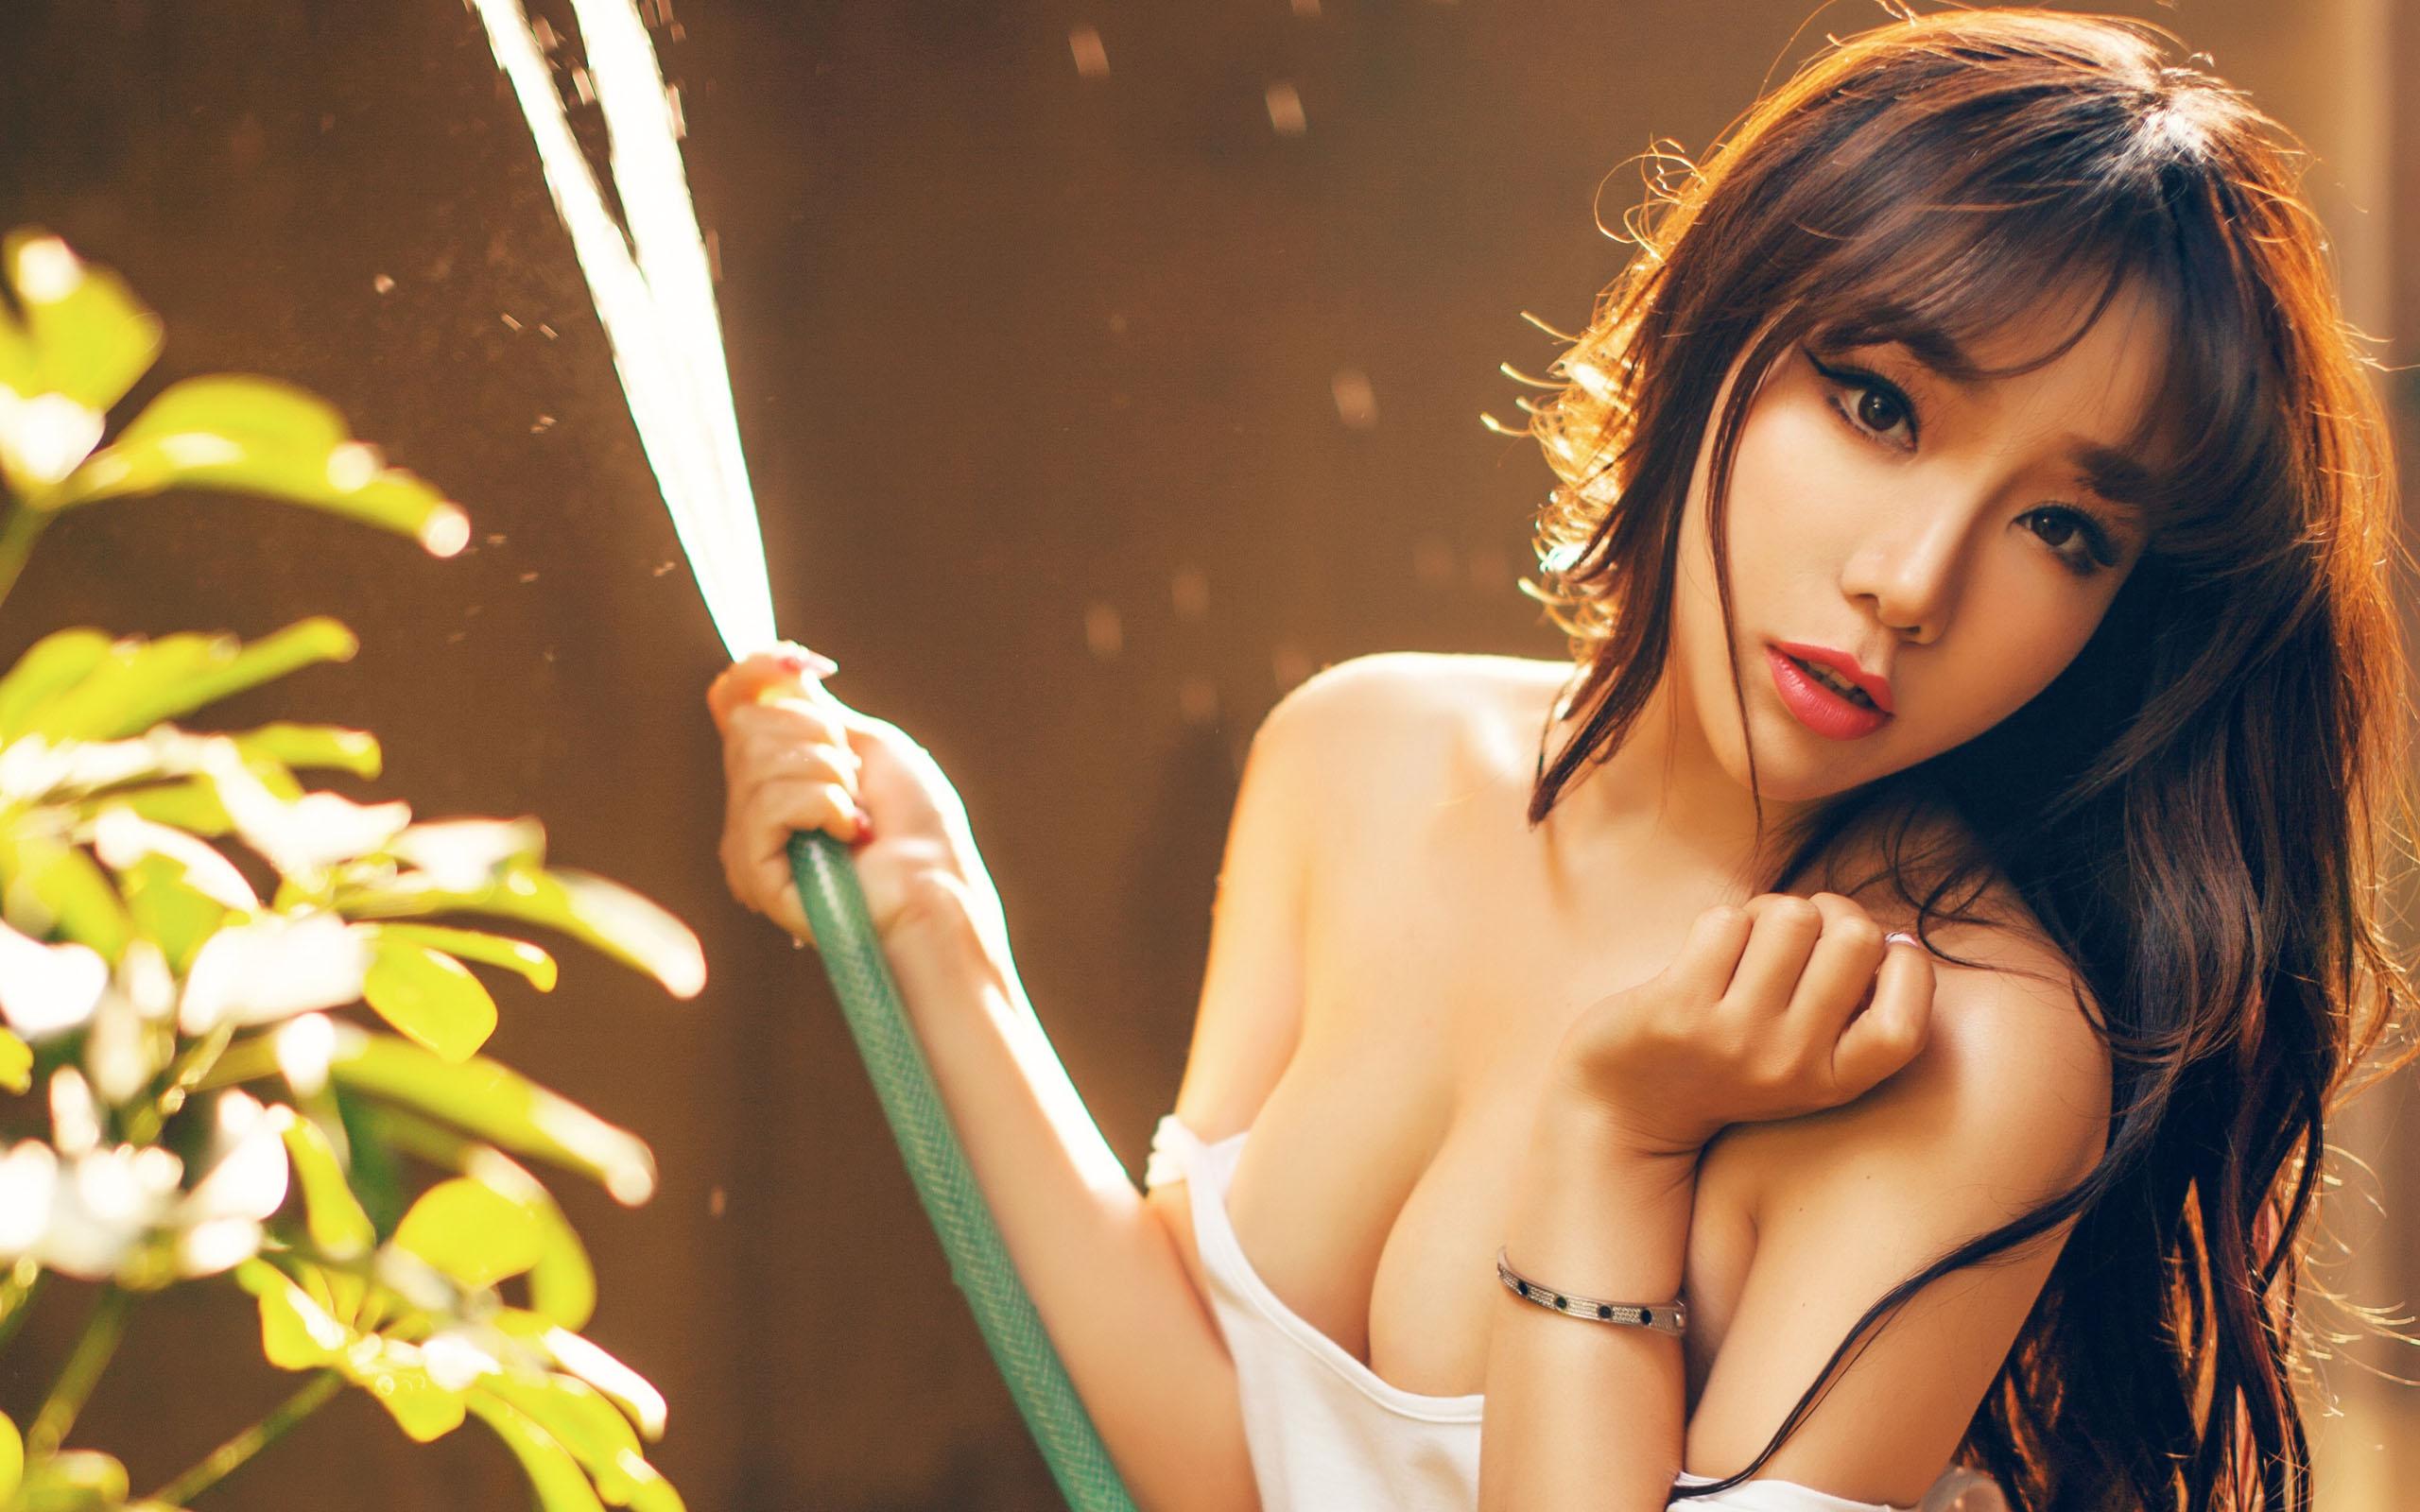 Sexy Asian Transgender Stock Photo